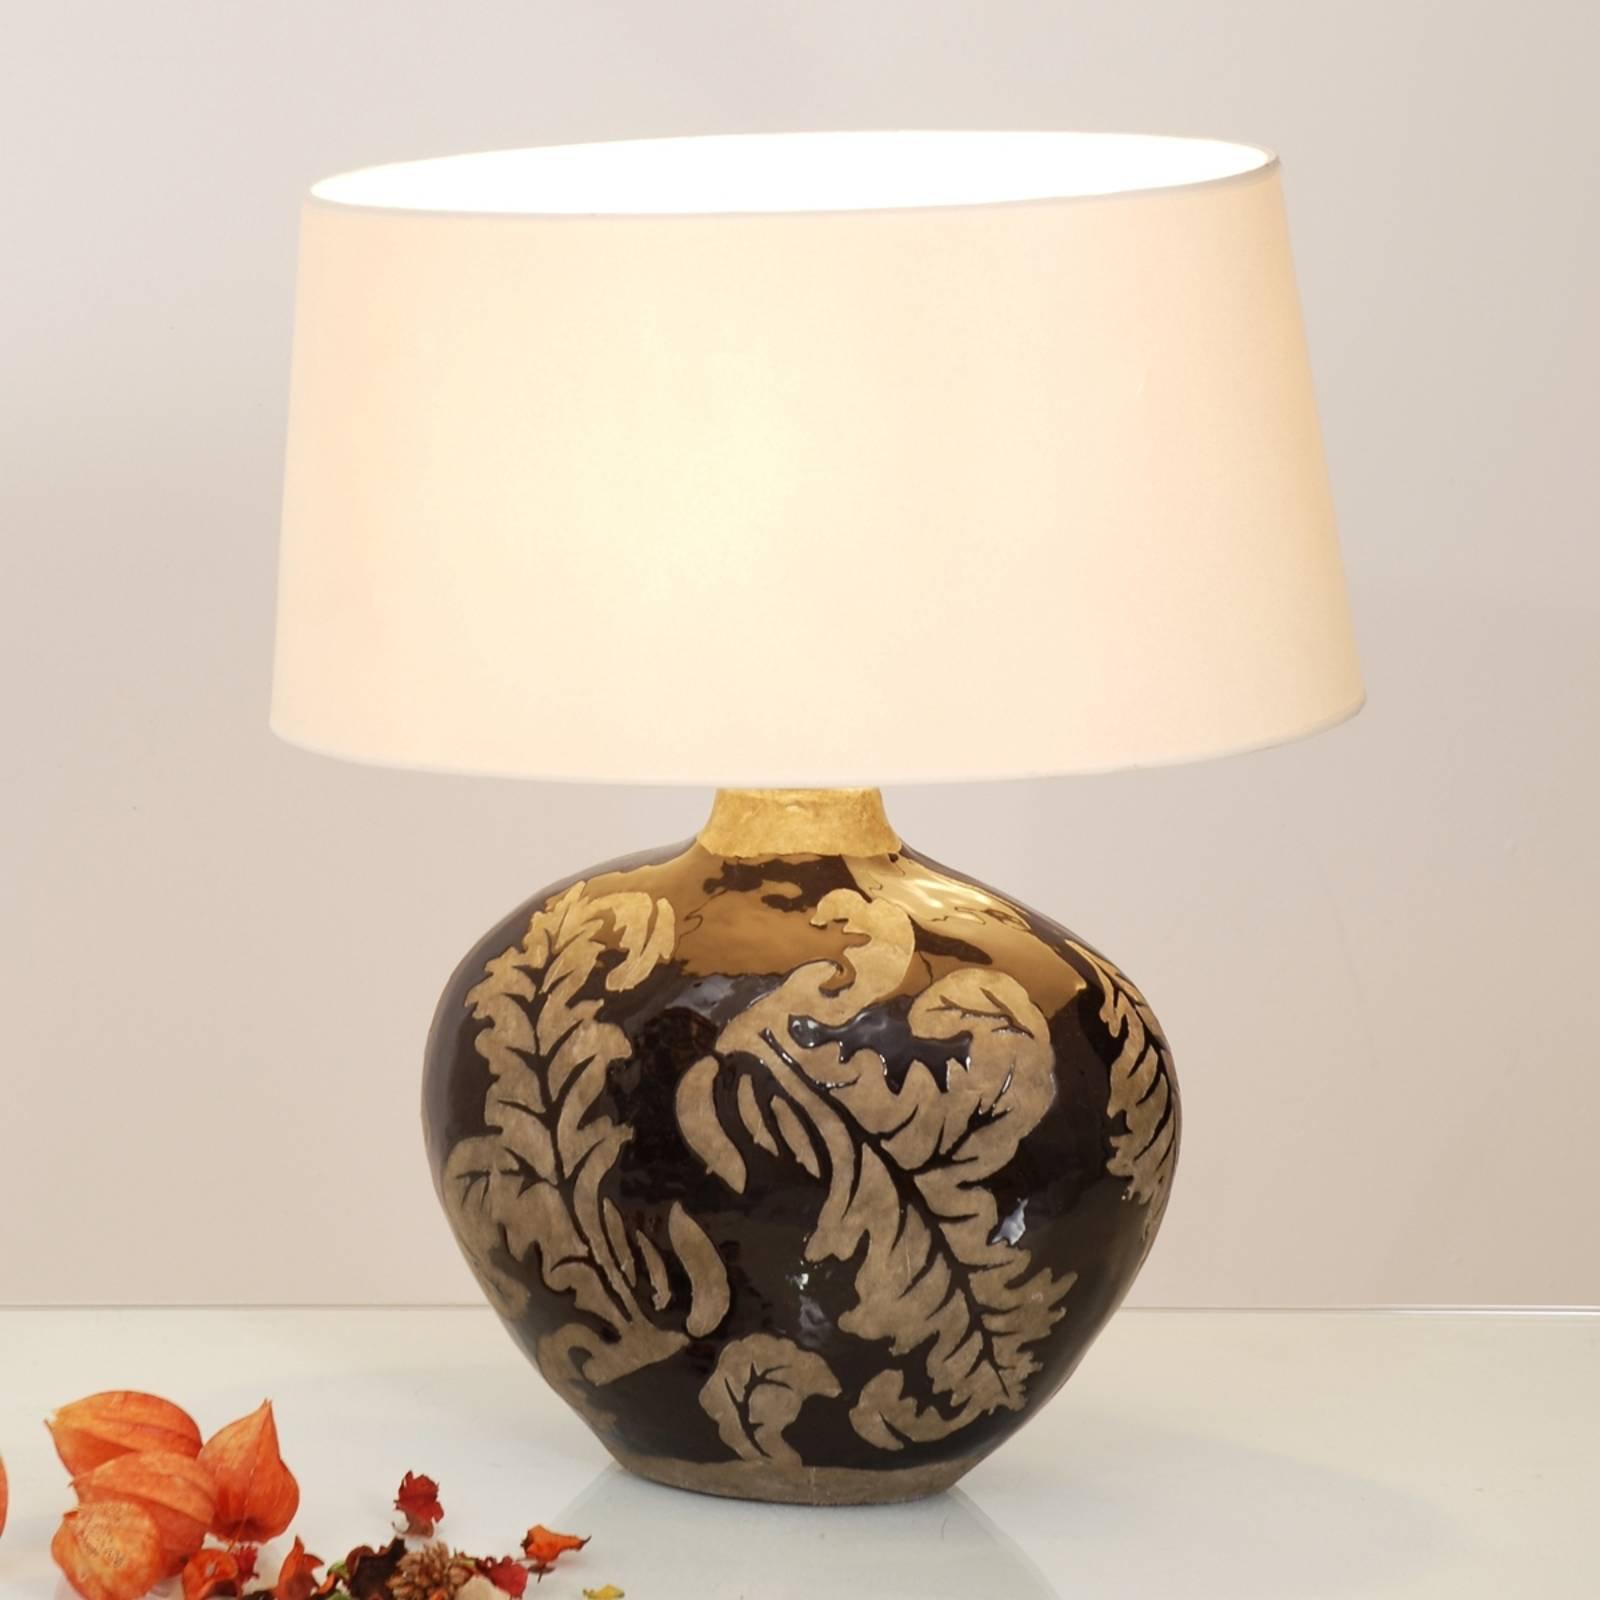 Bordlampe Toulouse, oval høyde 43 cm, svart